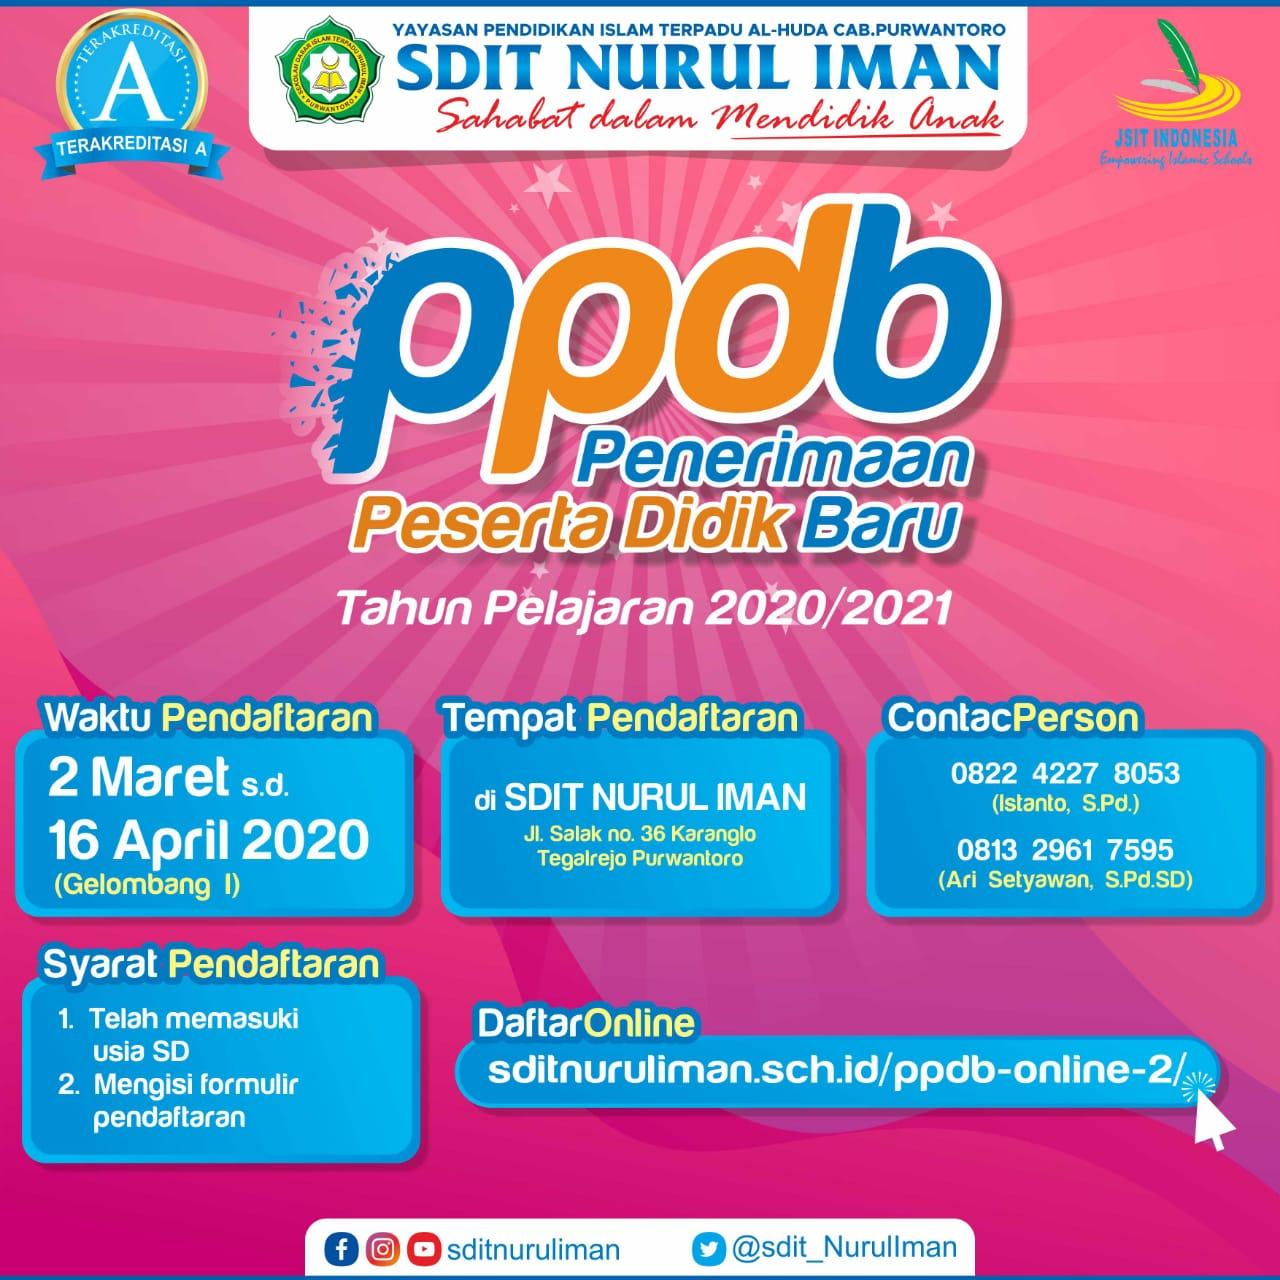 Penerimaan Peserta Didik Baru (PPDB) SDIT Nurul Iman Purwantoro Tahun Pelajaran 2020/2021